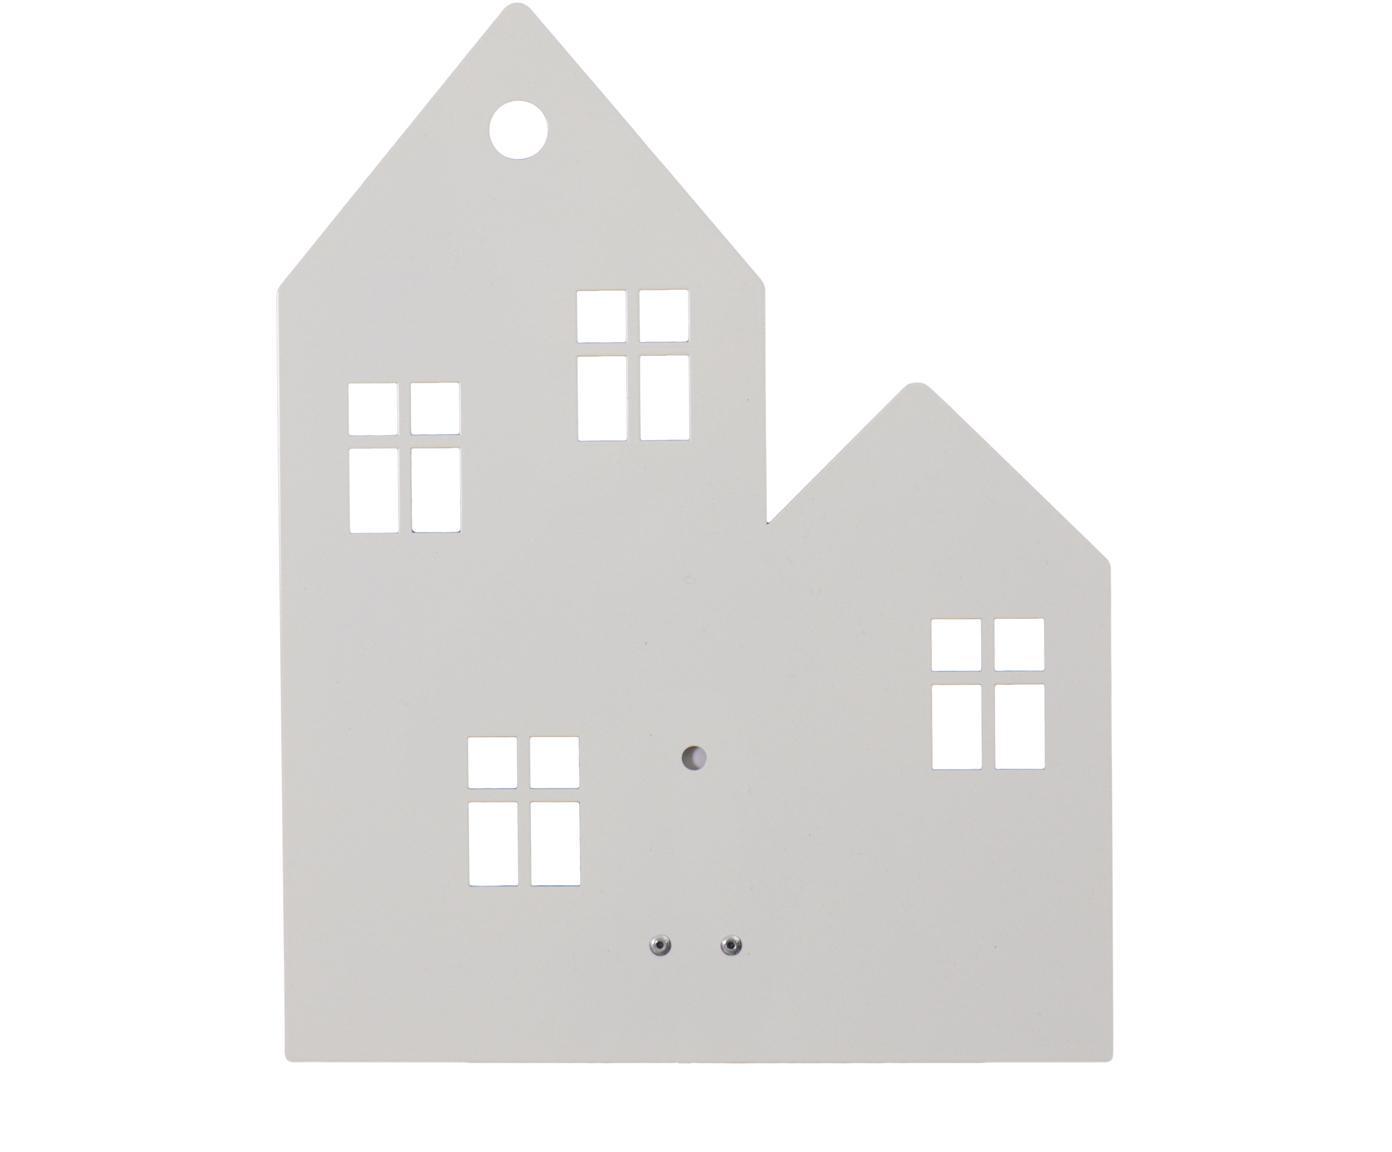 Wandlamp Town House met stekker, Gepoedercoat metaal, Wit, 24 x 35 cm